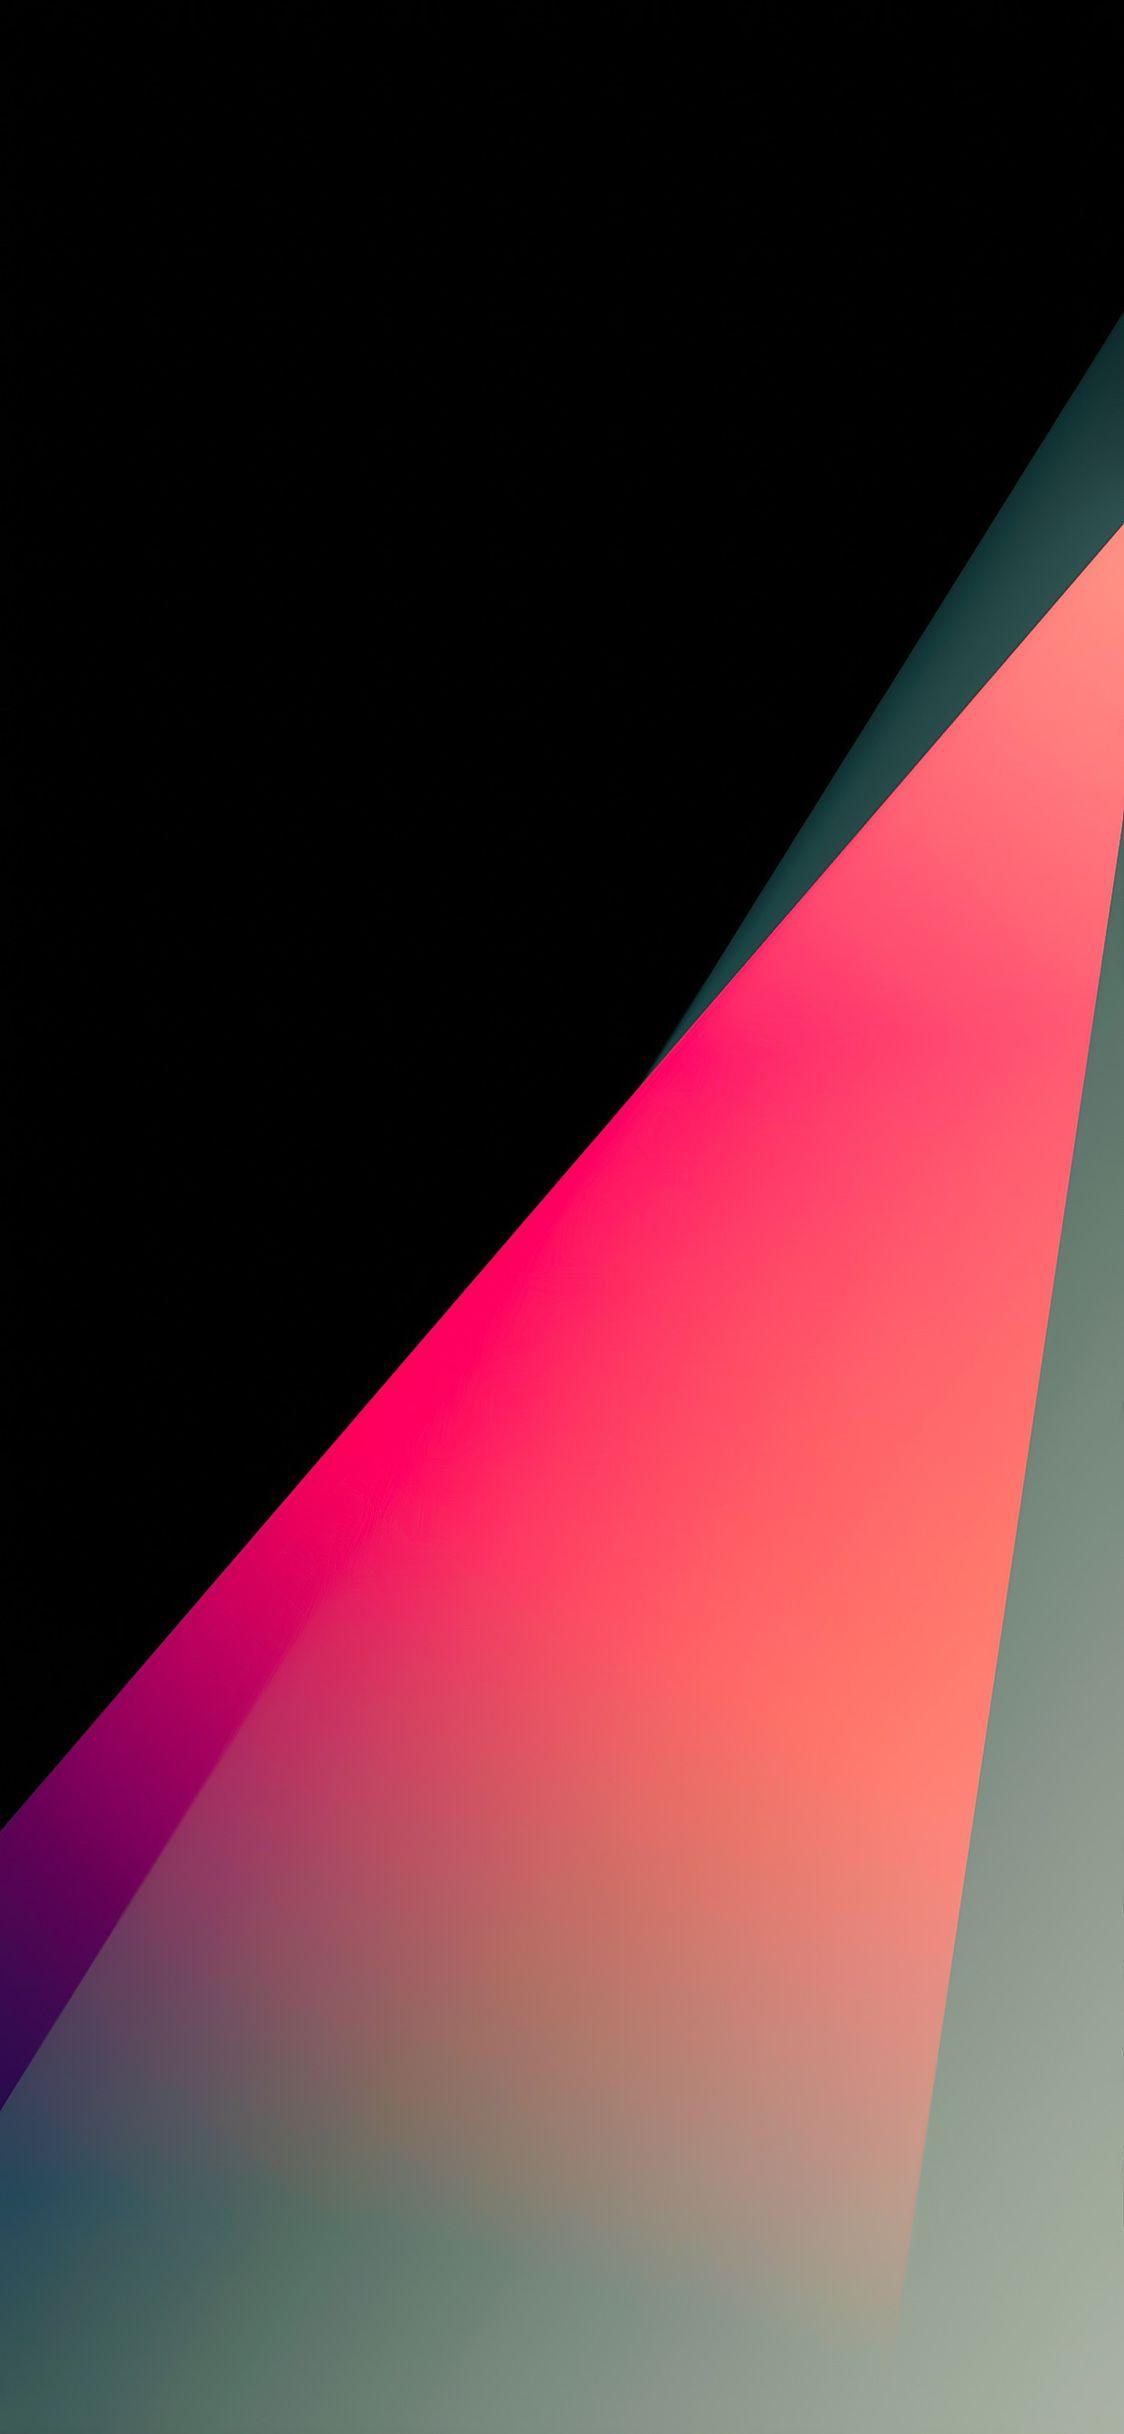 IMG_0814.jpg